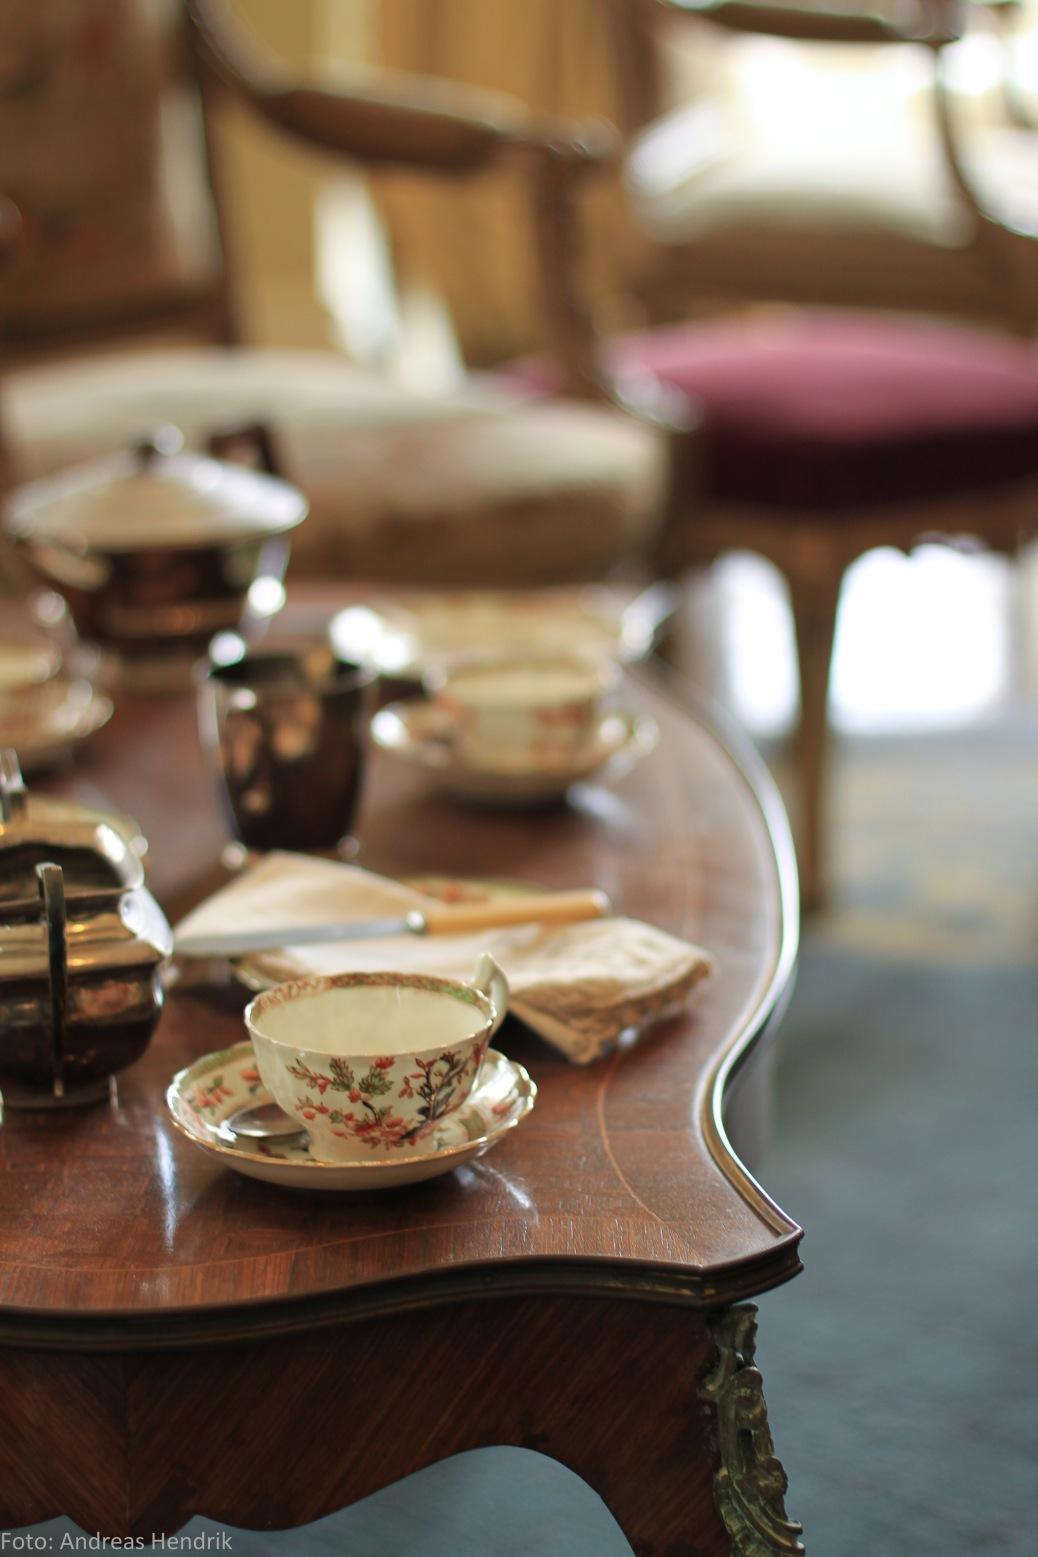 Kylemore Abbey Tea Set